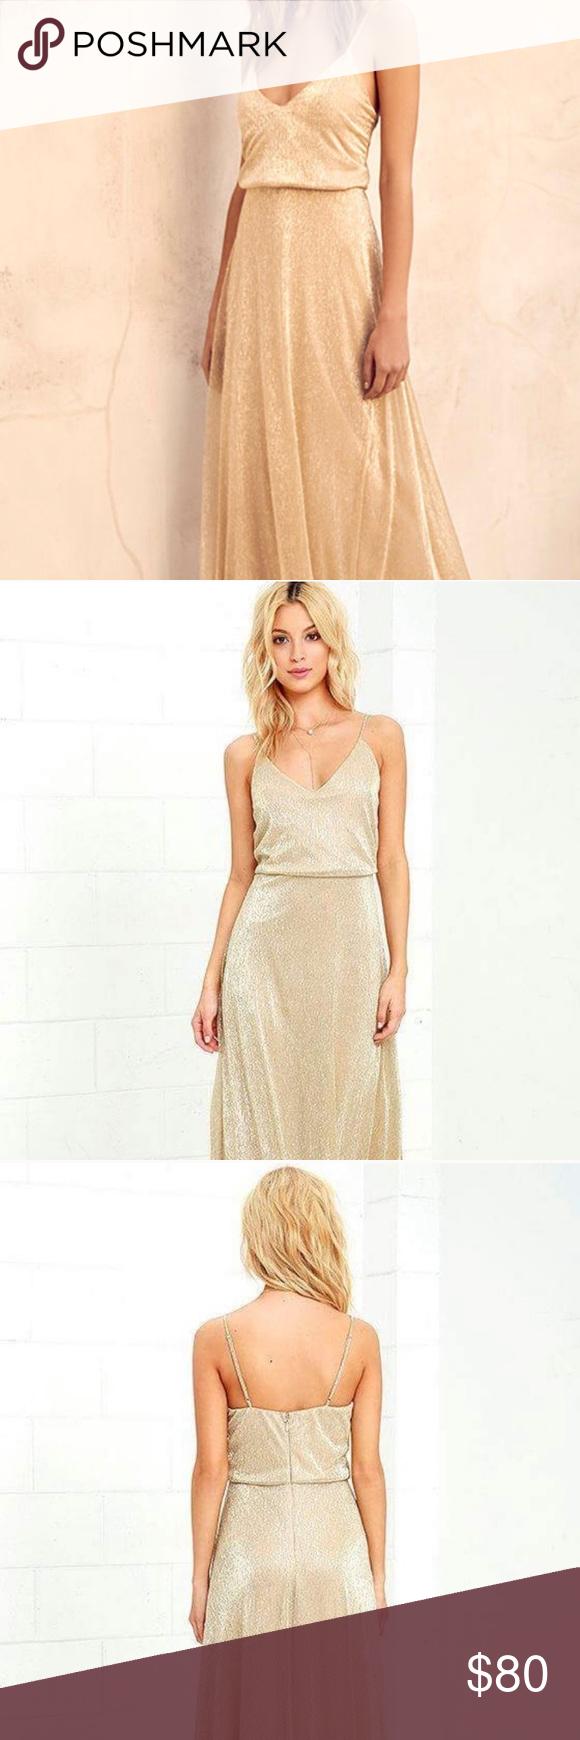 "b5169061ab NWT Lulu s Friend of the Glam Gold Maxi Dress - XS Never worn! ""All ..."